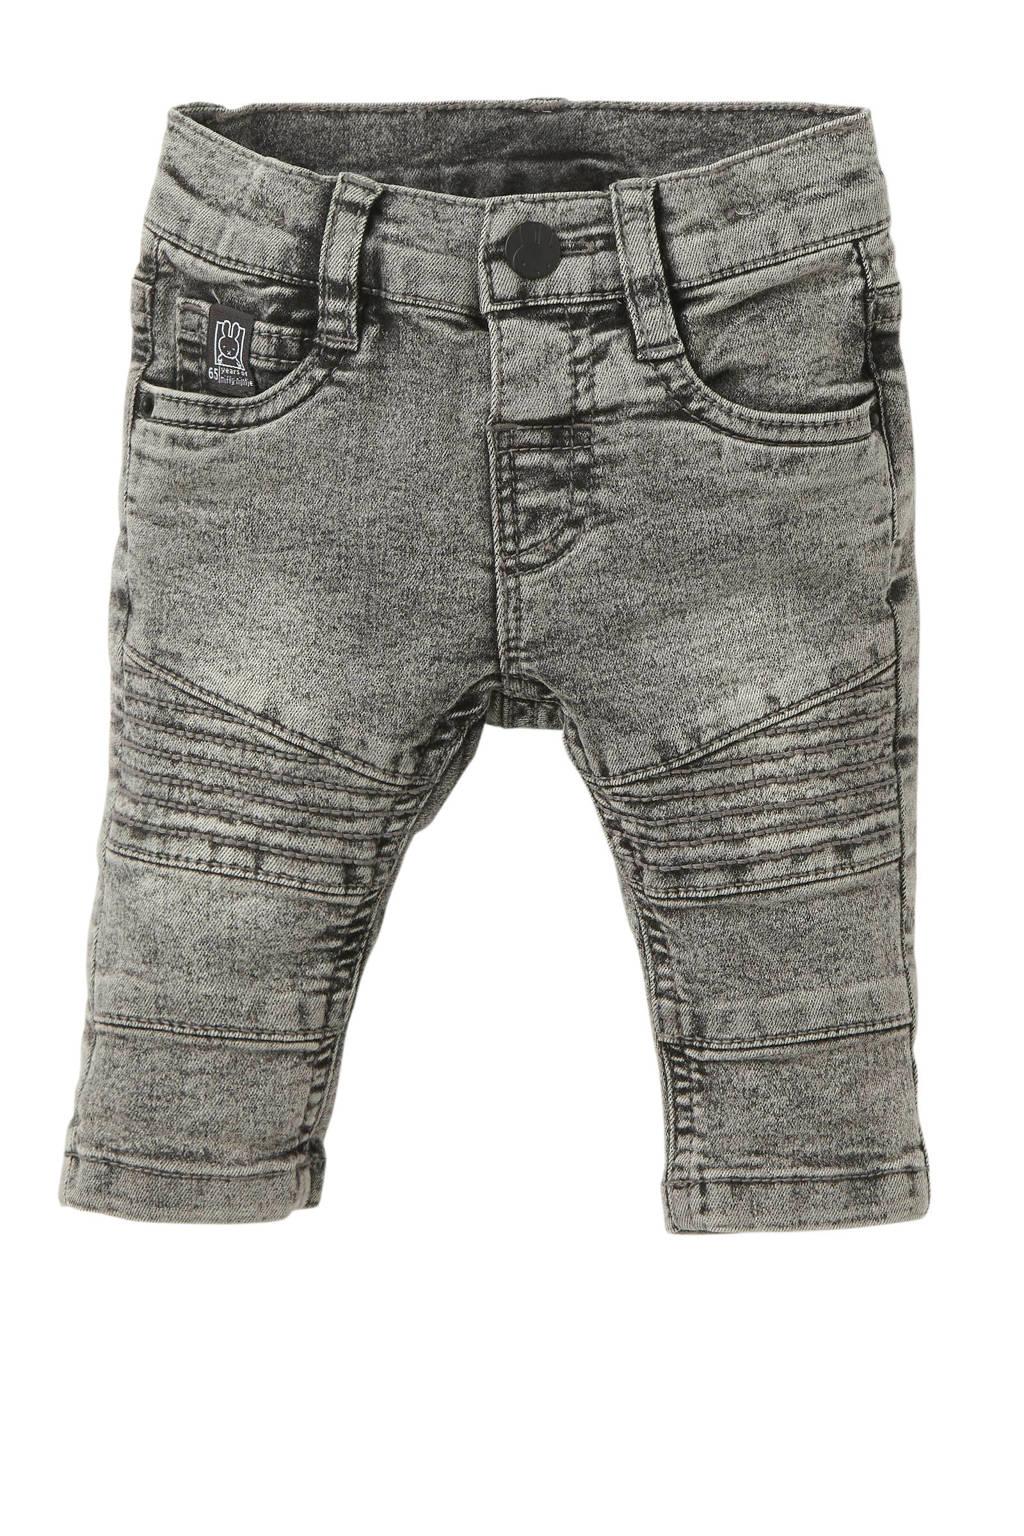 C&A baby regular fit jeans grijs, Grijs